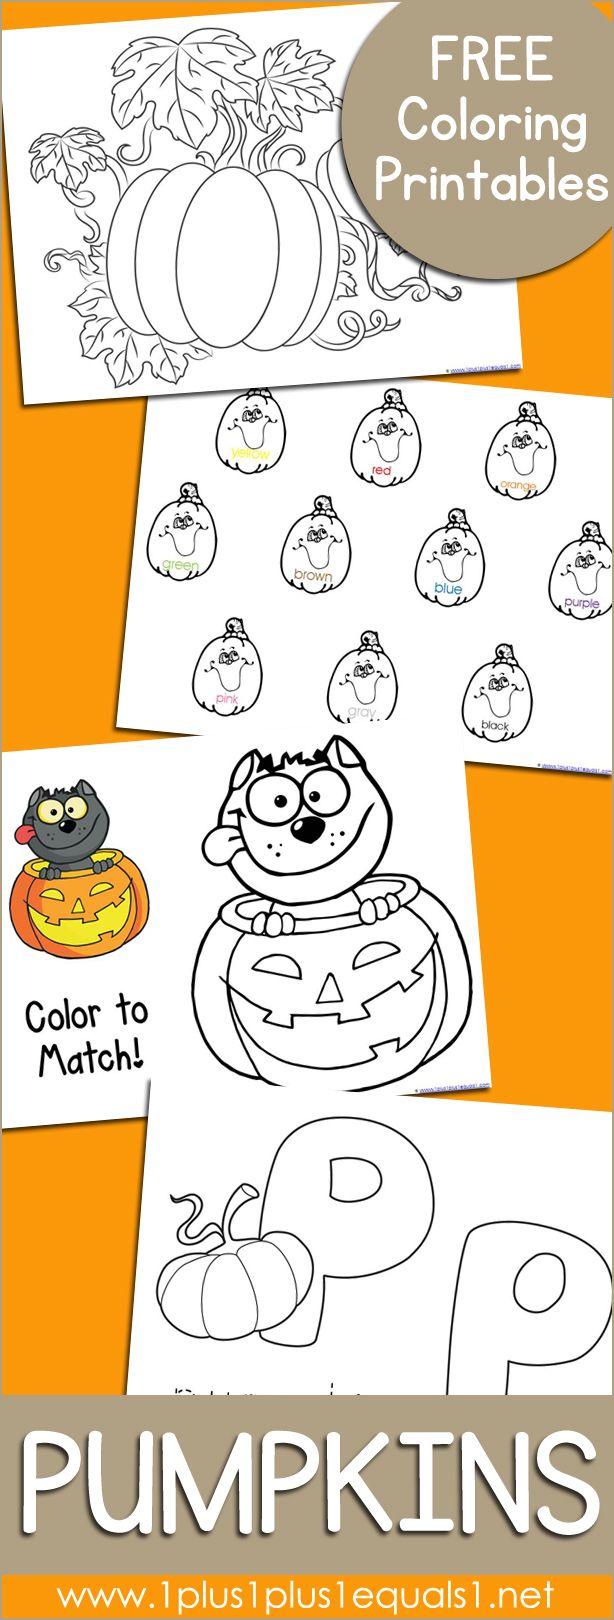 17 Best images about Pumpkin Theme